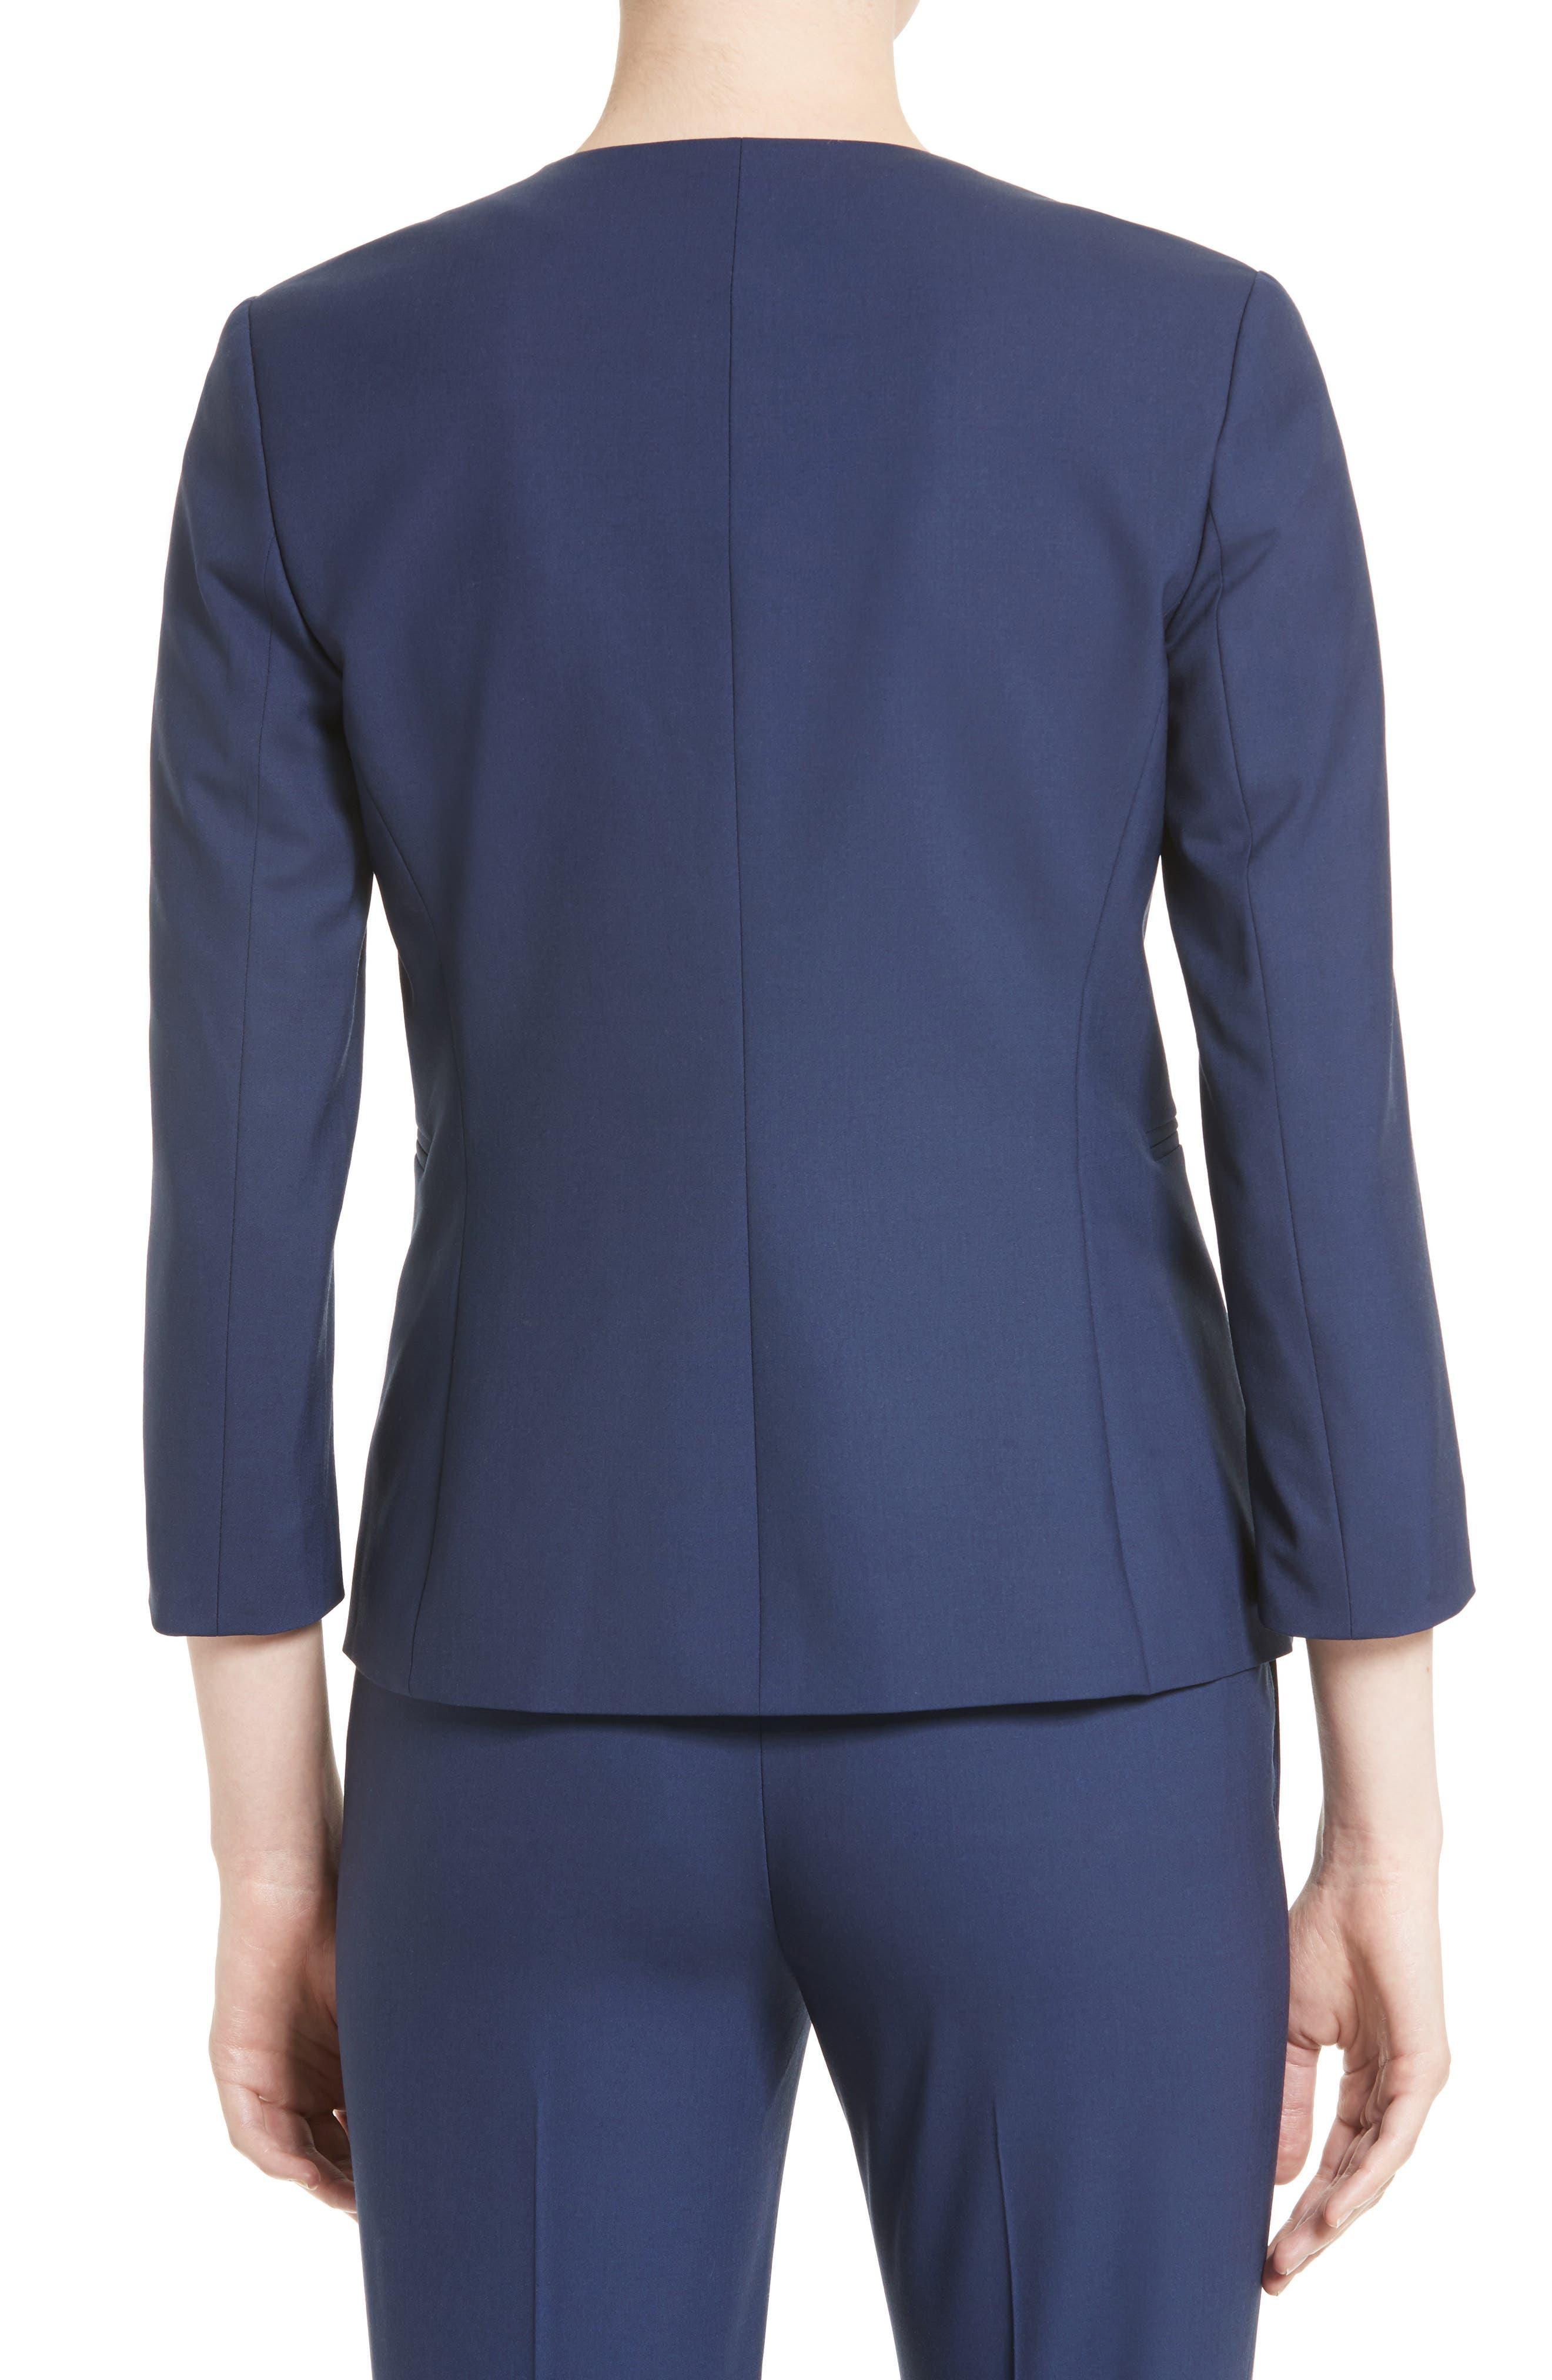 Lindrayia B Good Wool Suit Jacket,                             Alternate thumbnail 6, color,